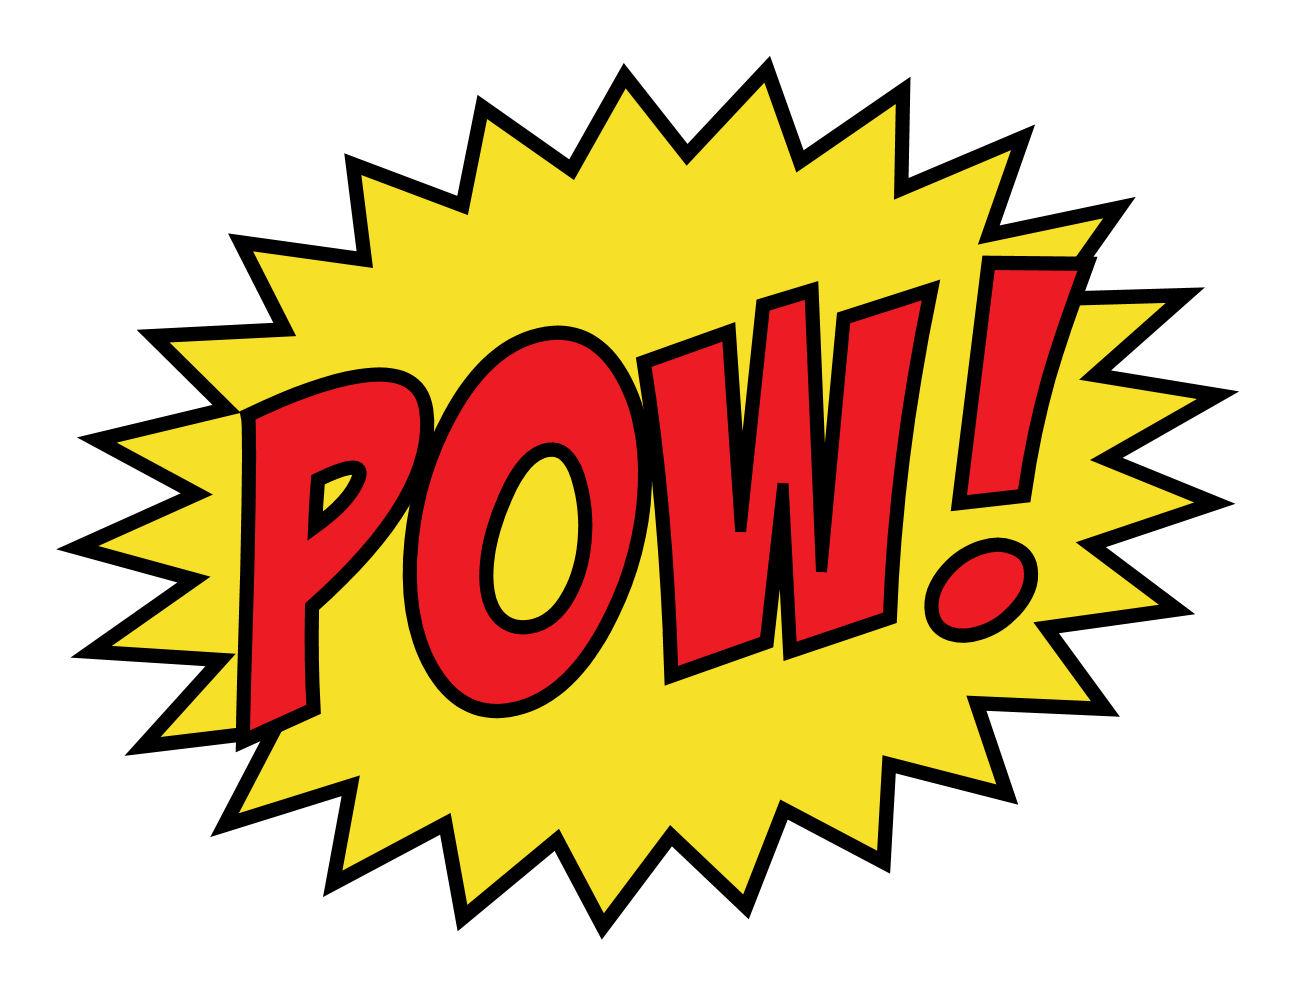 Superhero zap pow clipart library vector library stock Free Batman Pow Font, Download Free Clip Art, Free Clip Art ... vector library stock